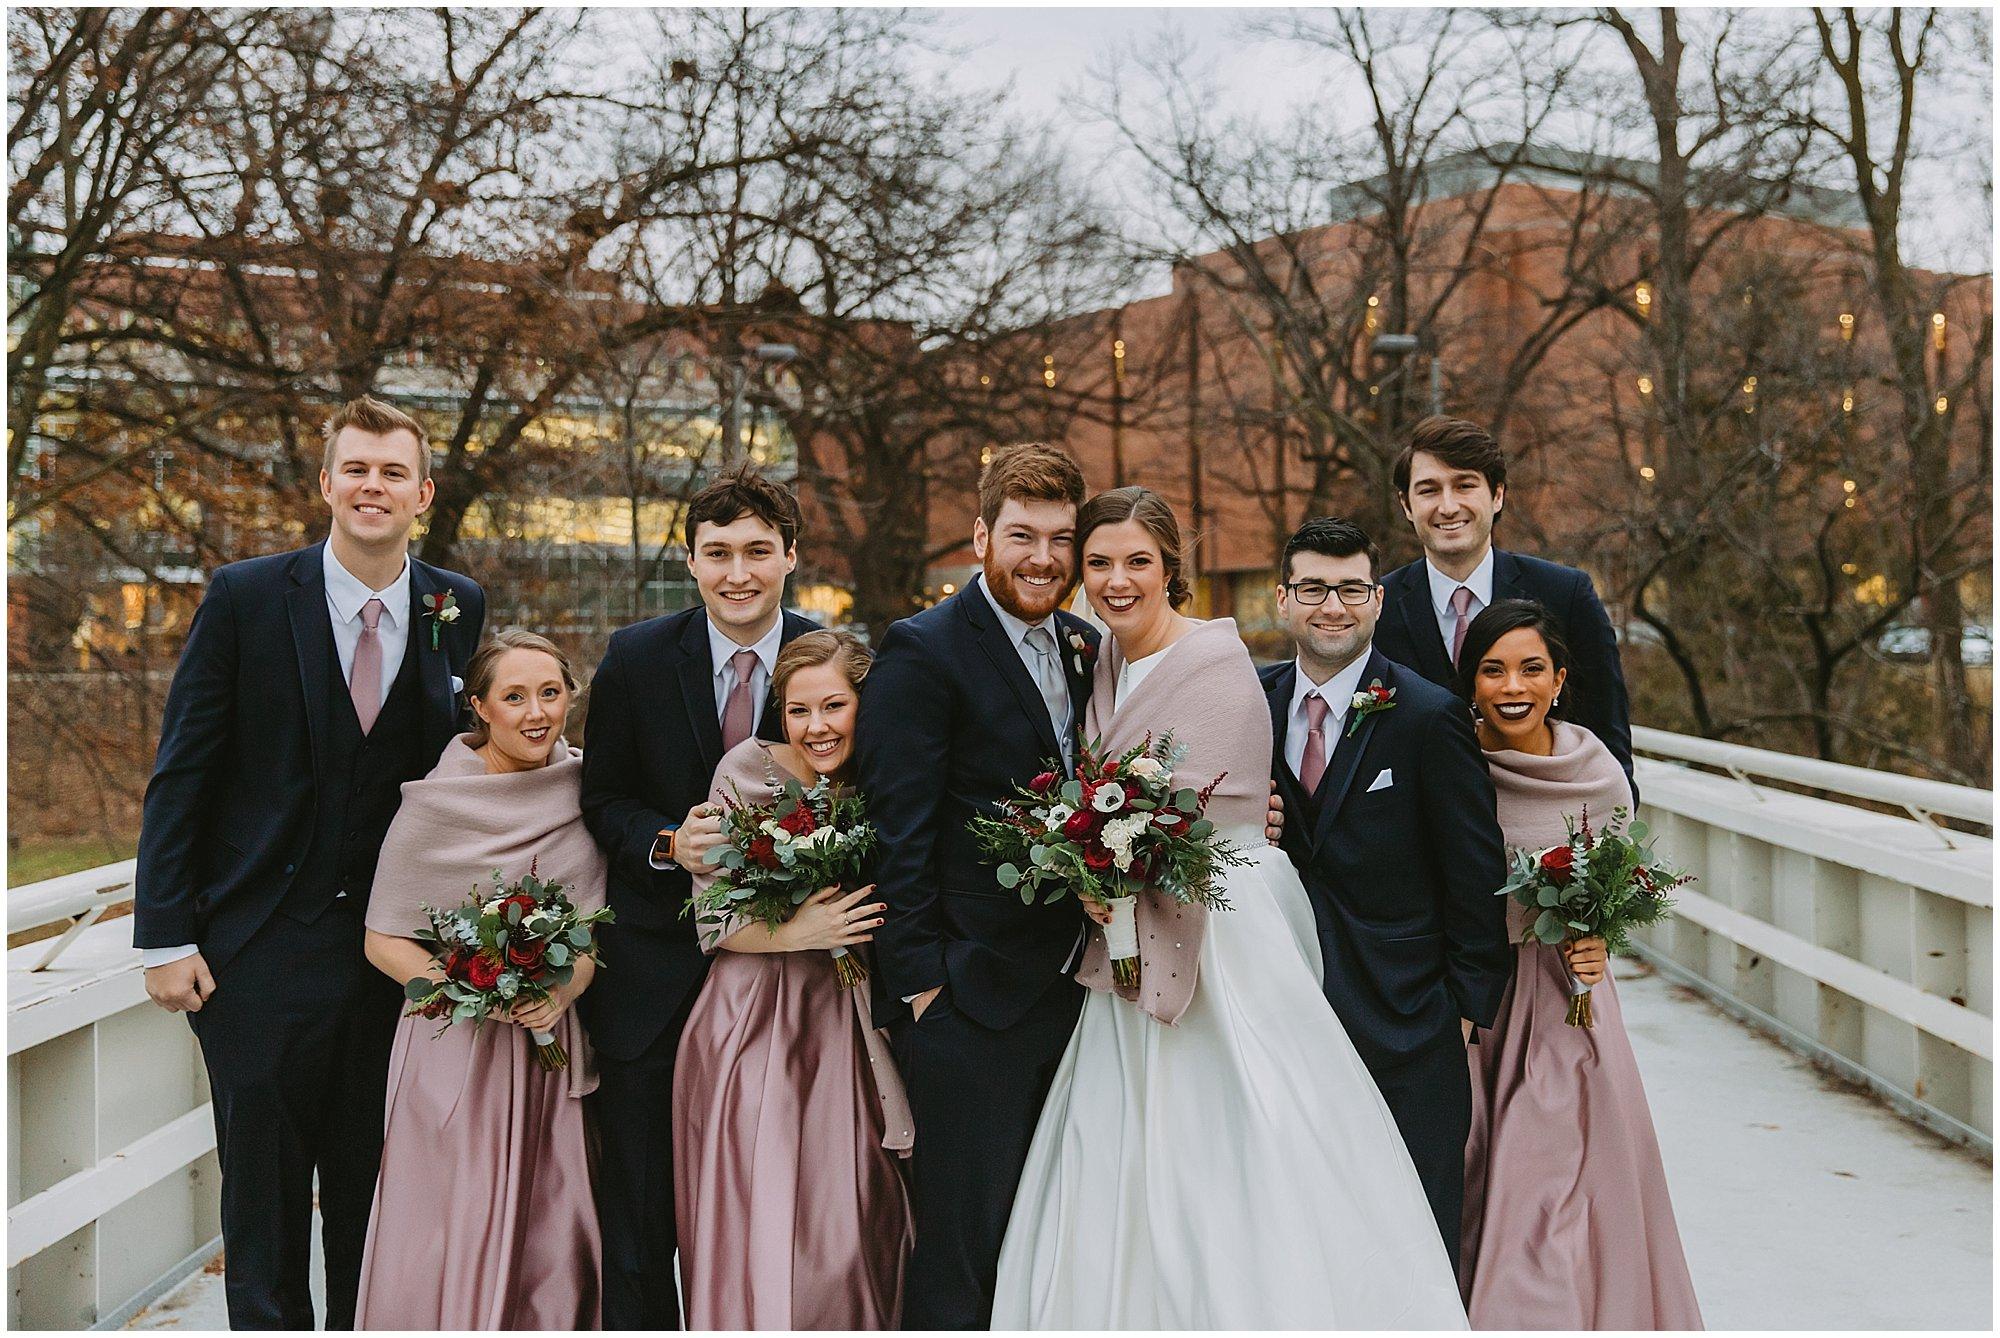 Michigan State Wedding Party